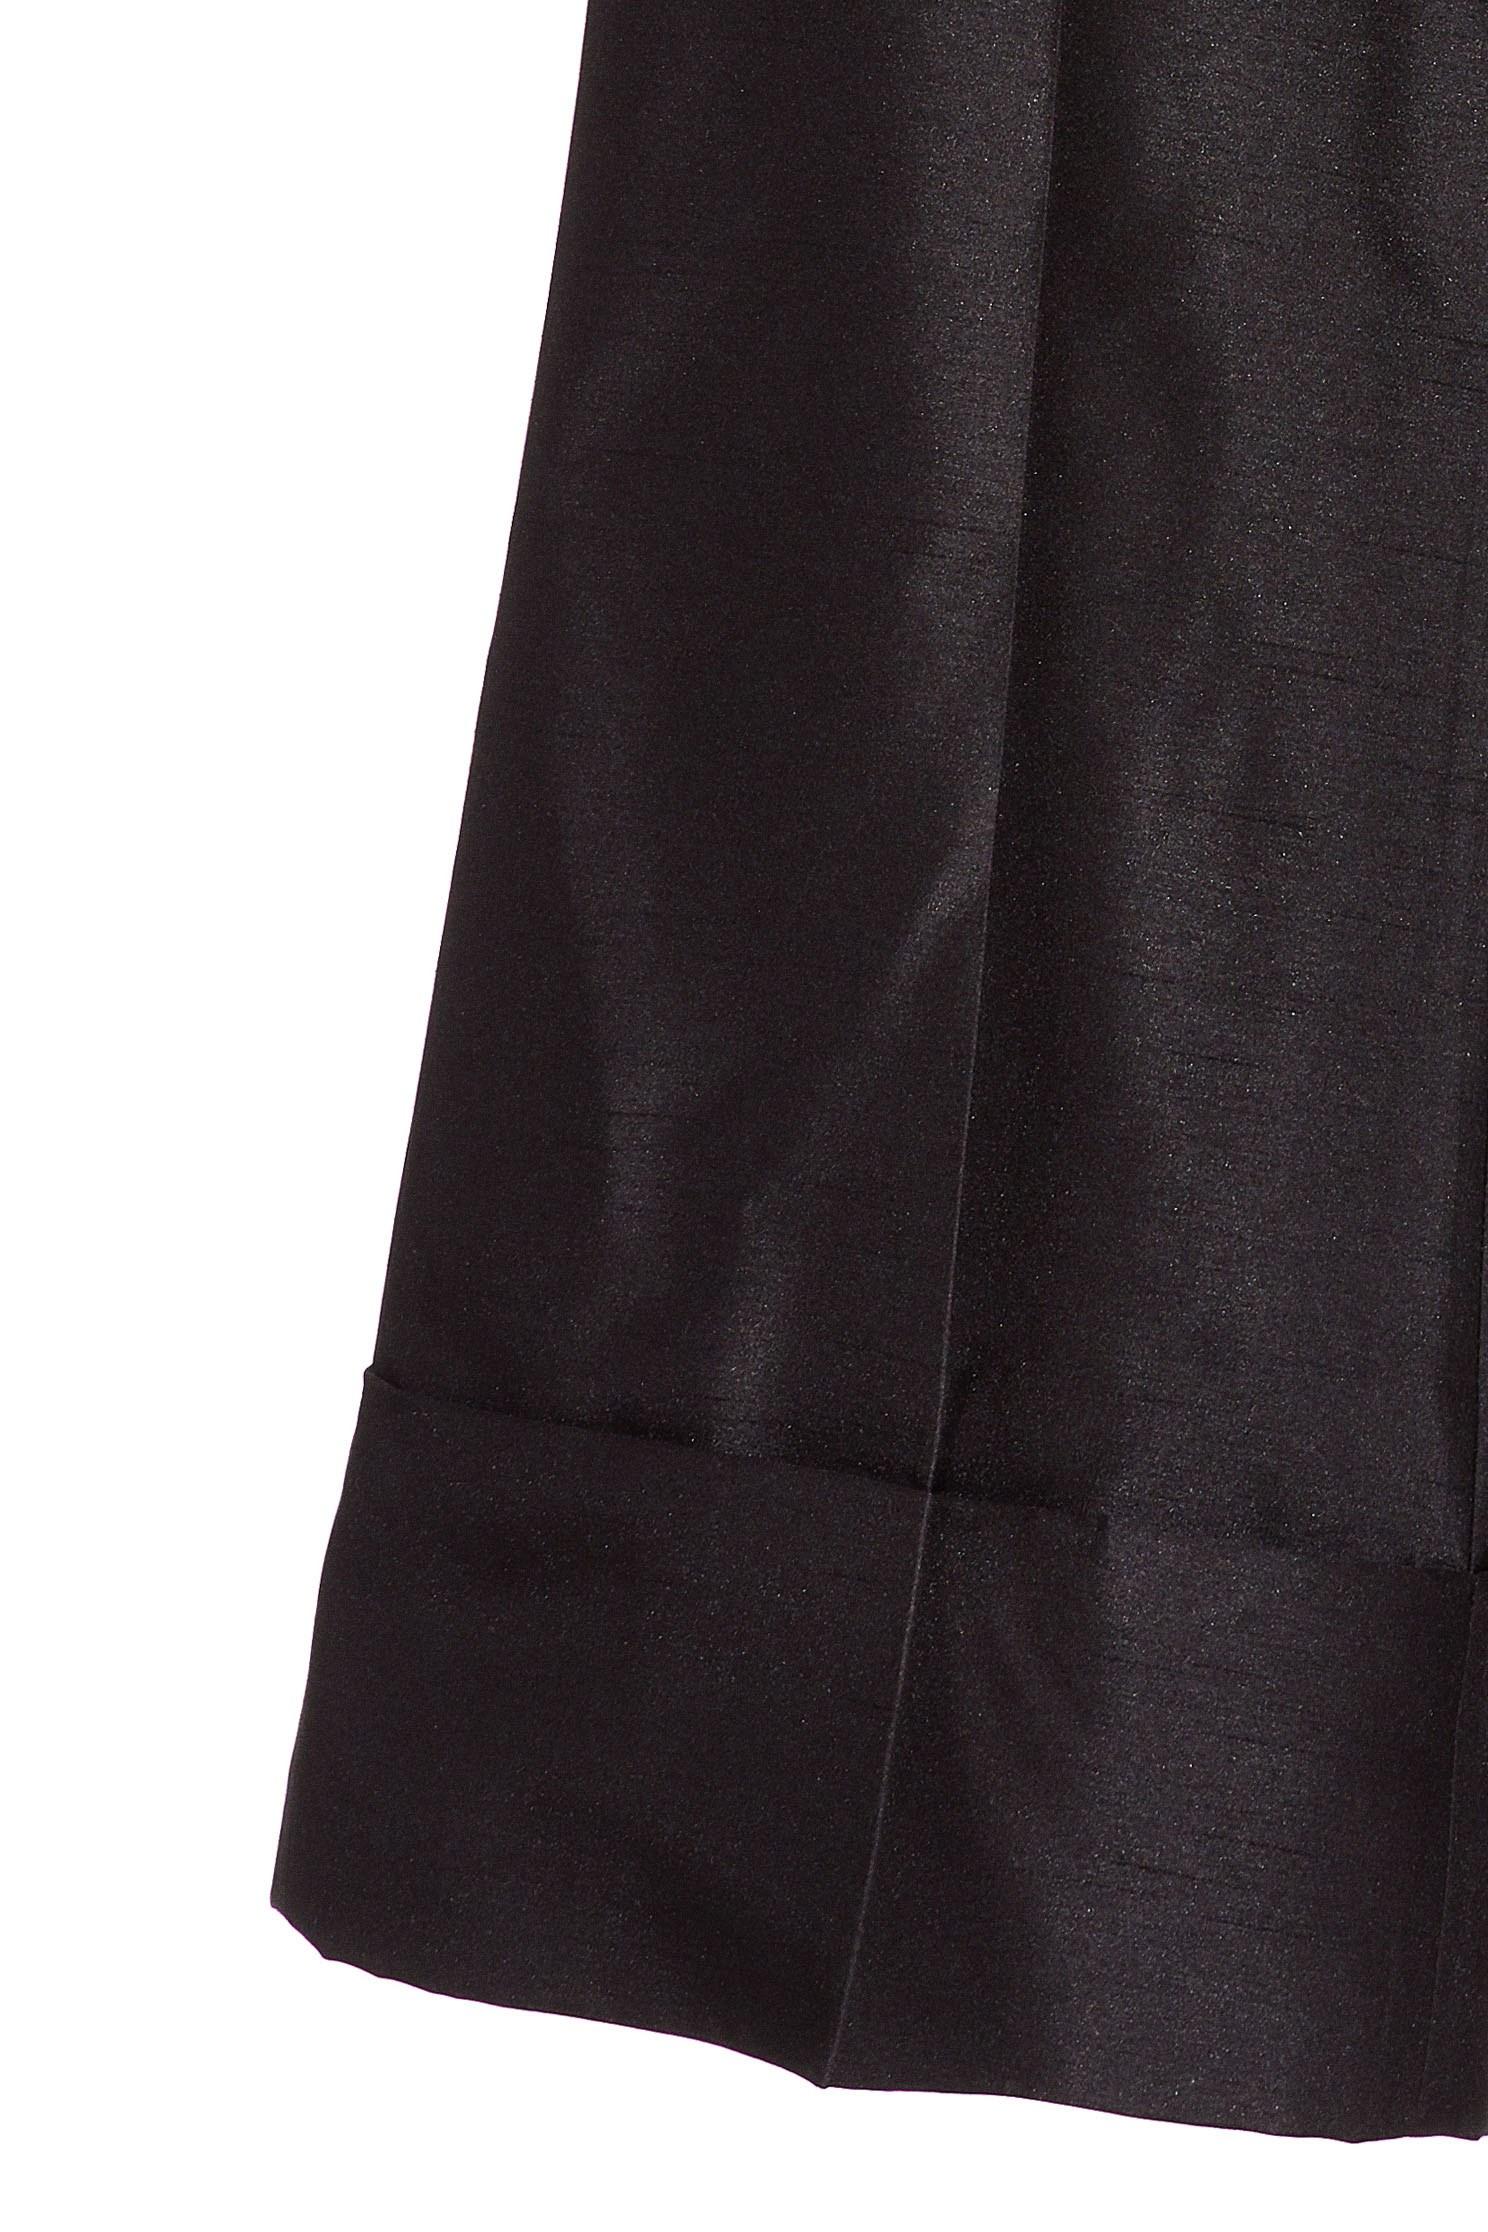 Satin reflexive fashion long pants,culottespants,pants,trousers,pants,wasthin,blacktrousers